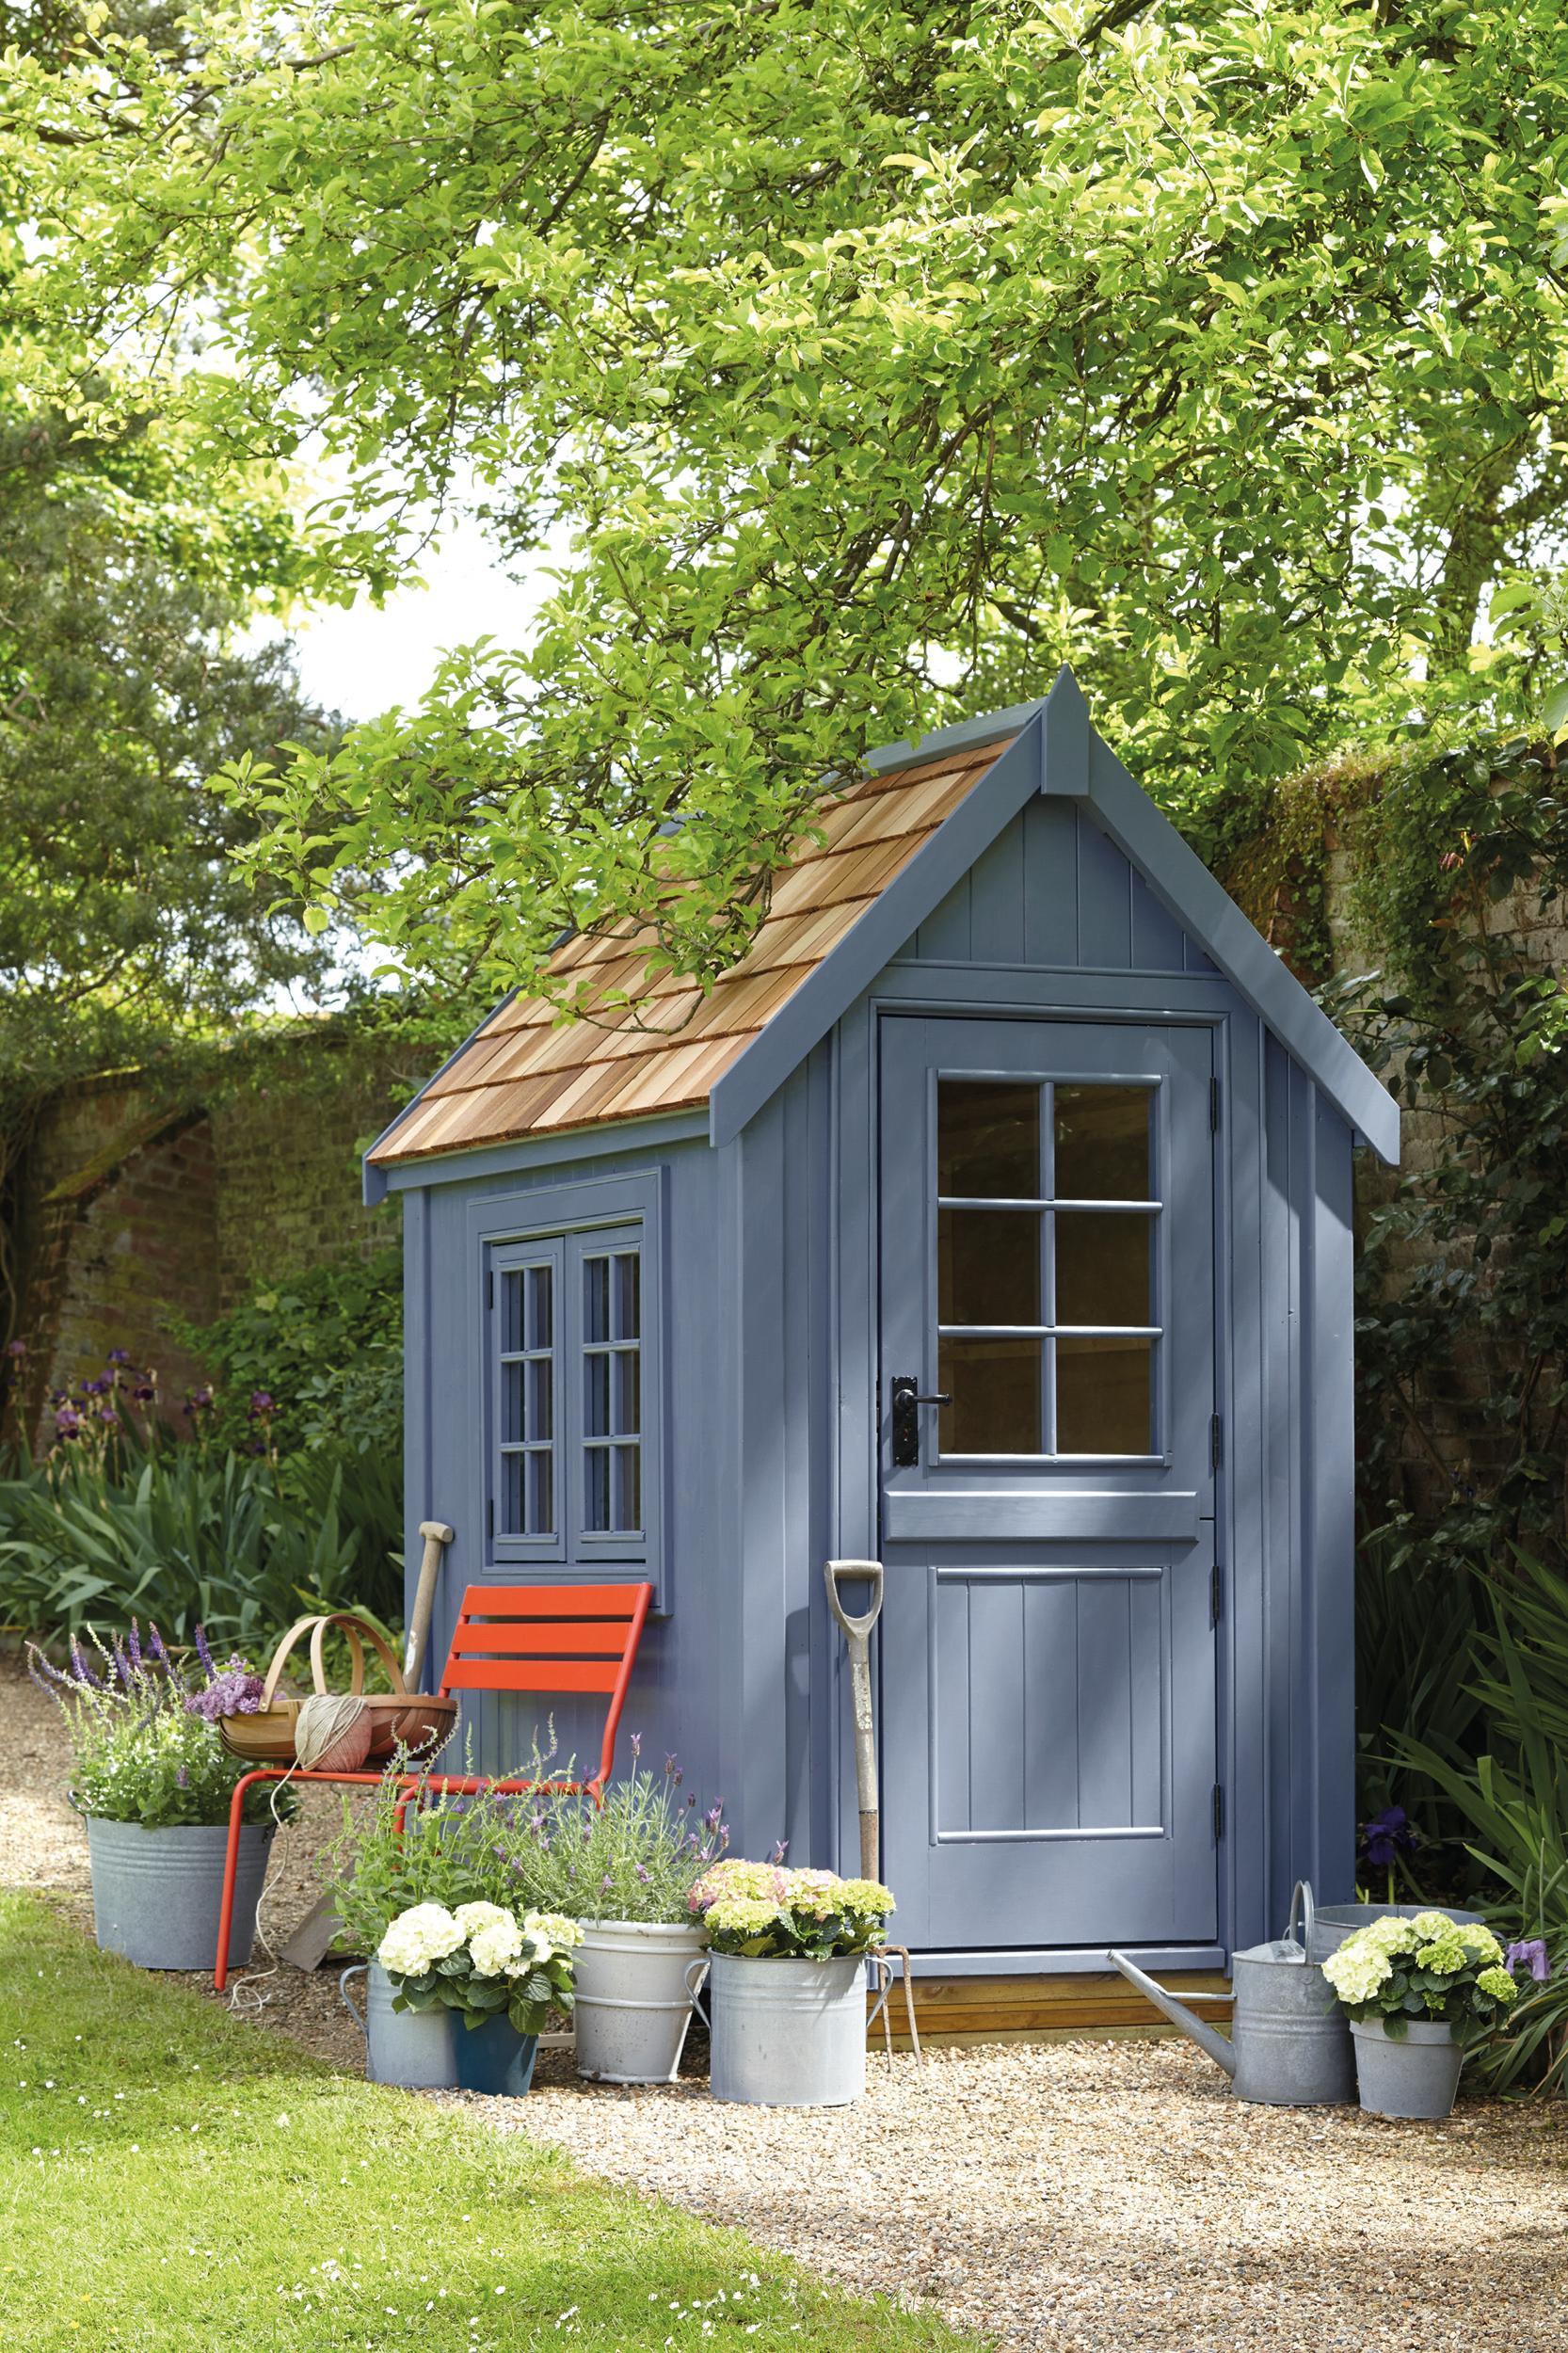 Skandinavische Gartenhäuser gartenhaus bilder ideen couchstyle